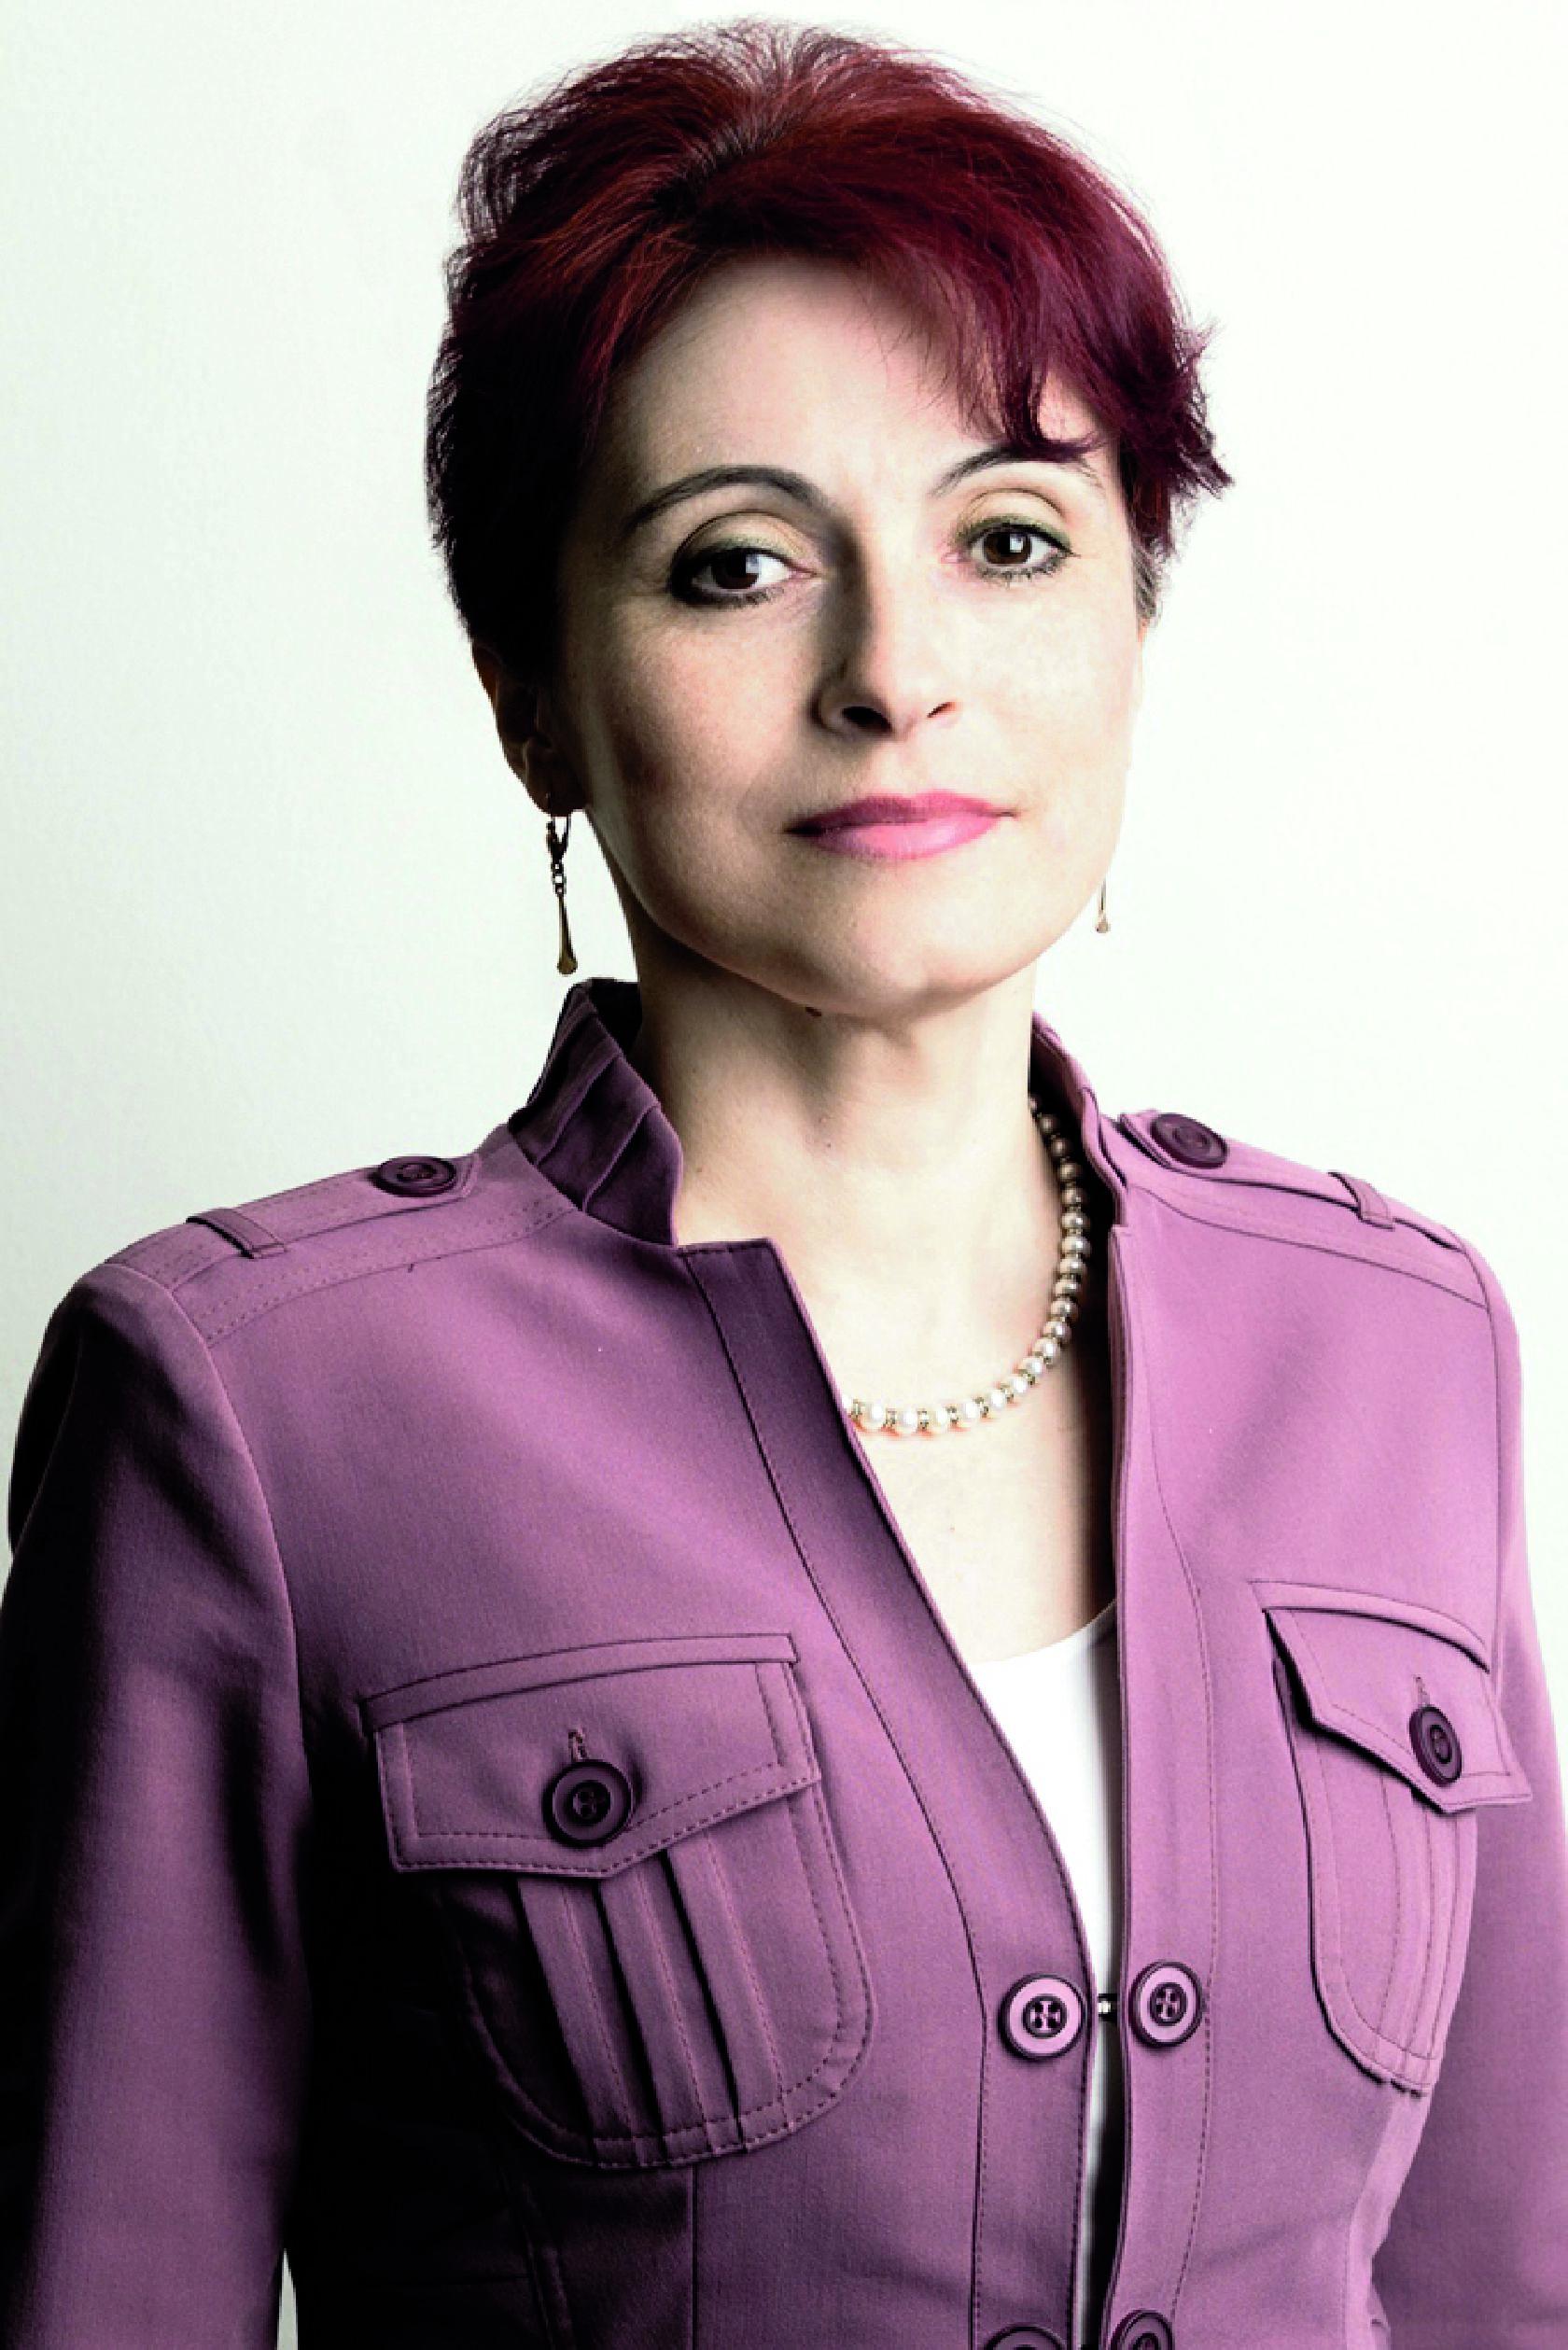 Оксана Семенова, глава Краснозерского района